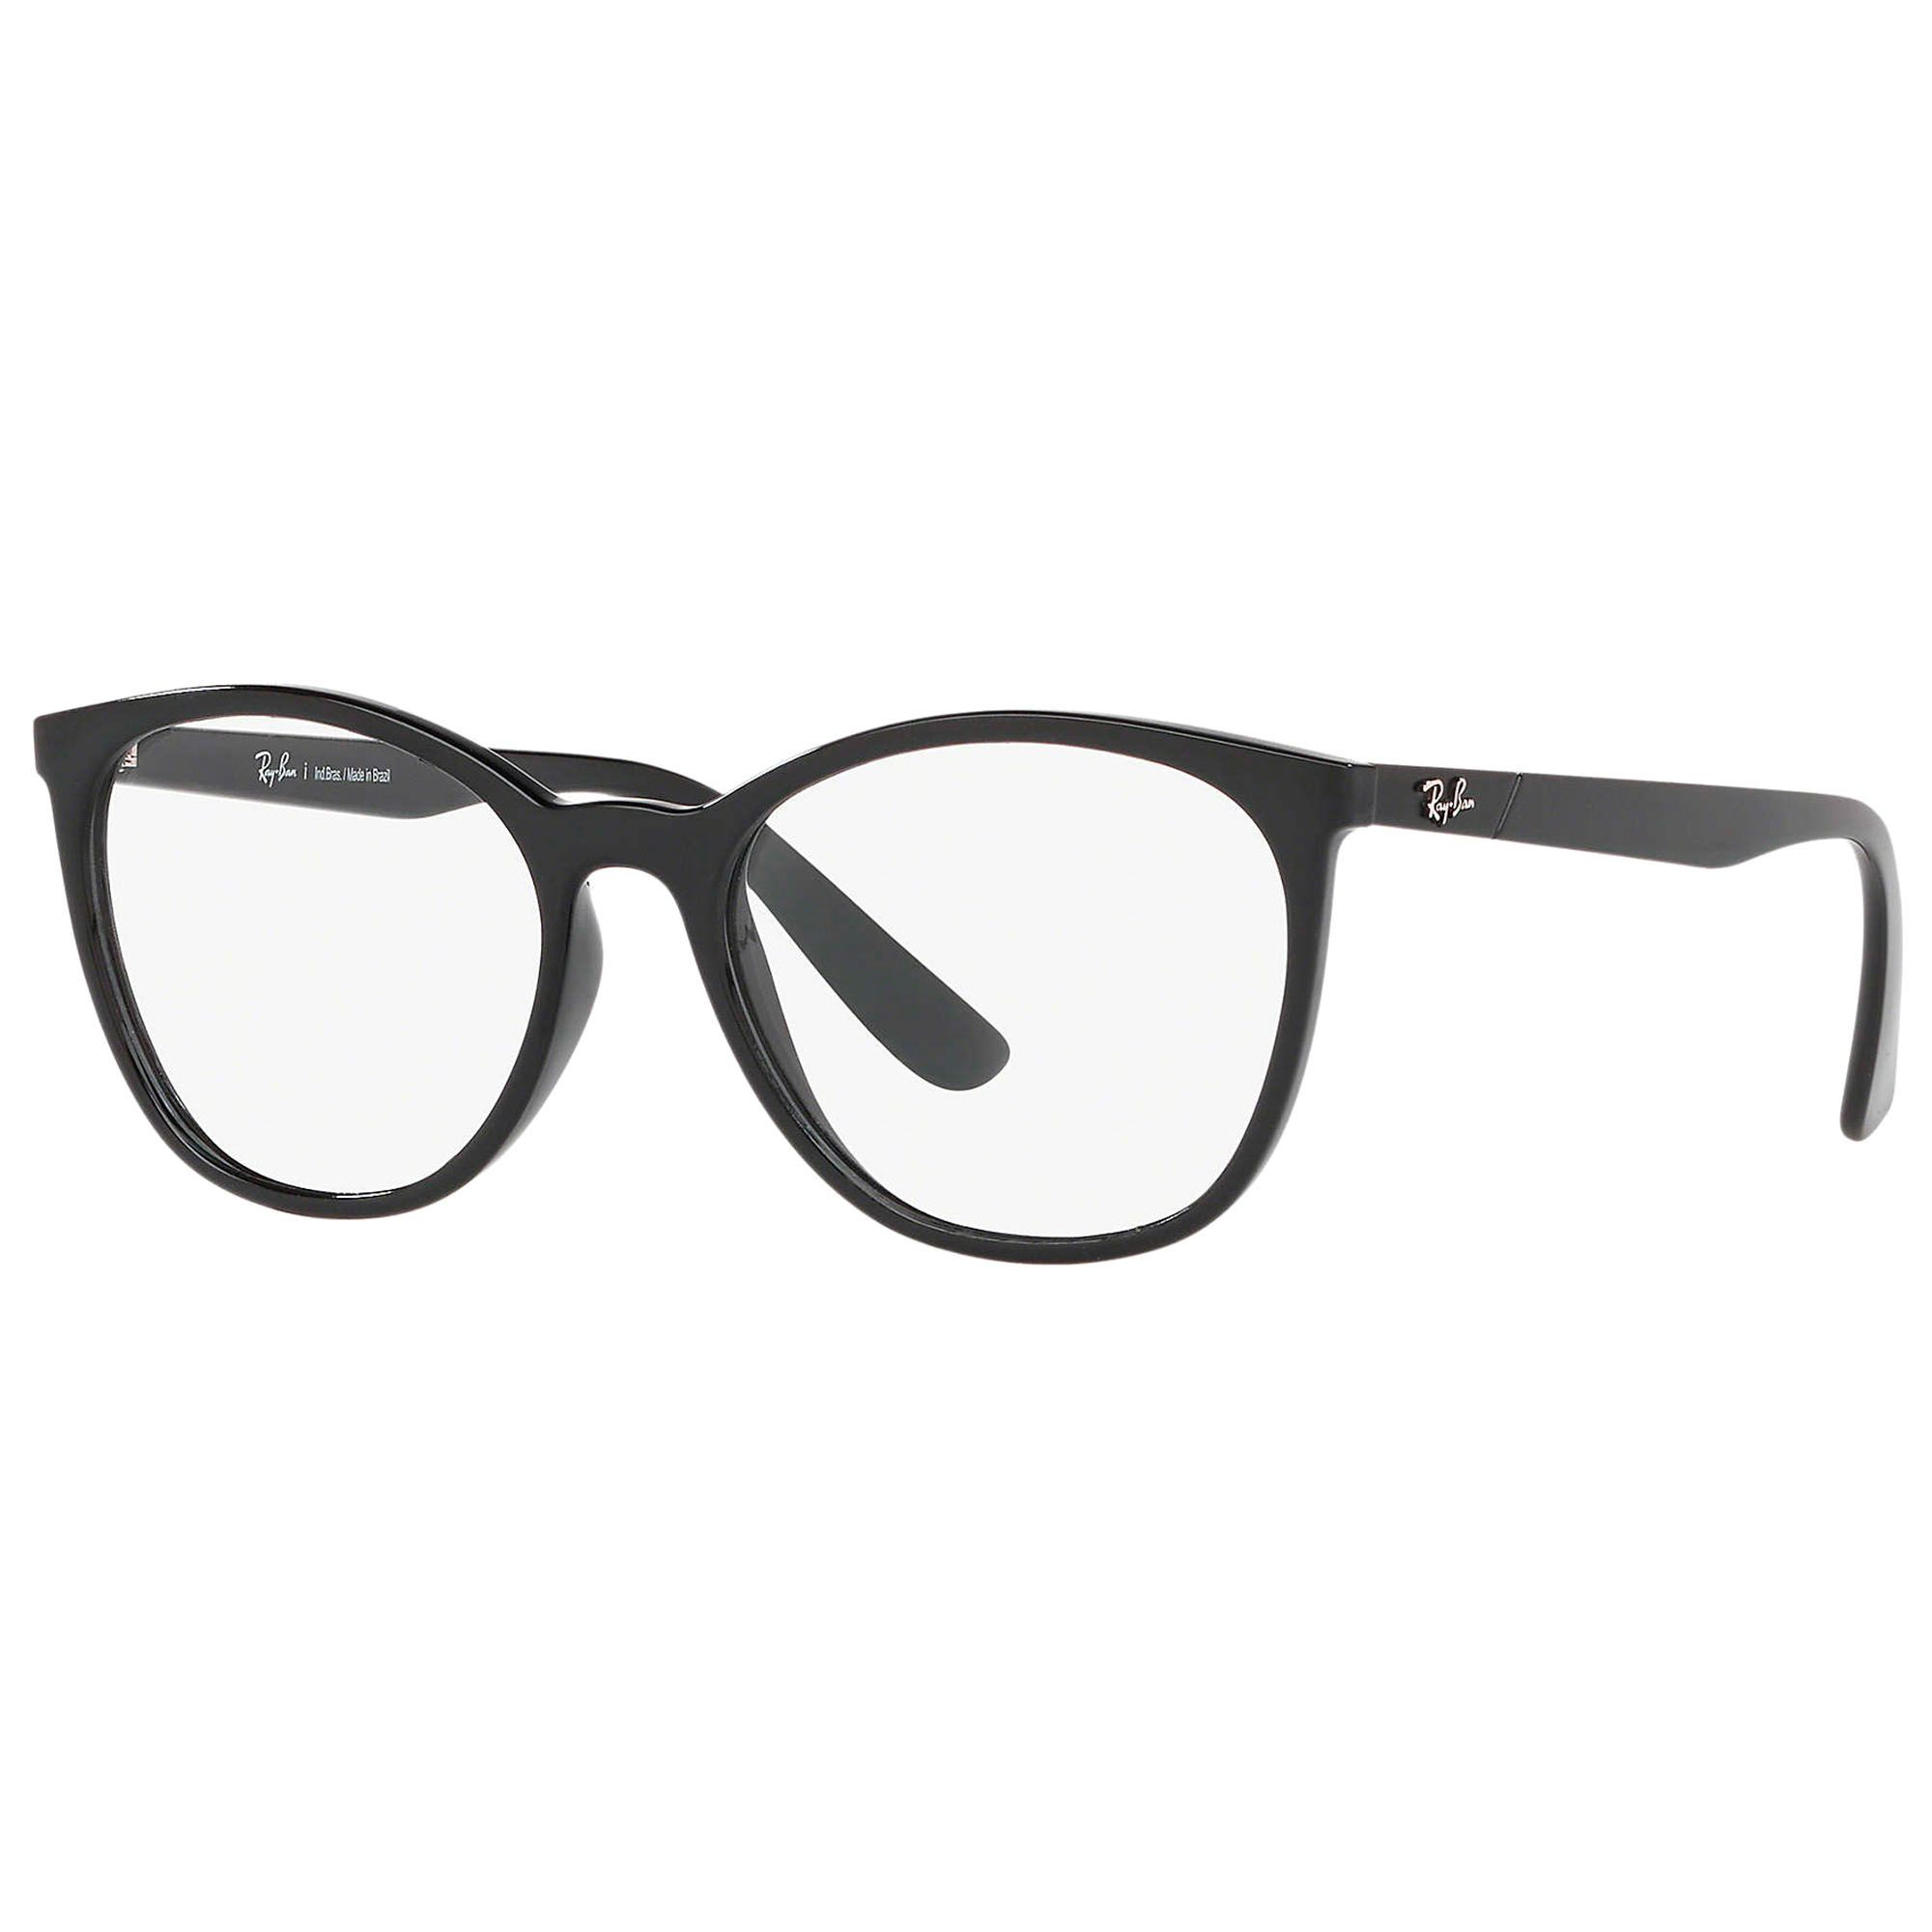 Óculos de Grau Feminino Ray-Ban RB7161L 2000 52-16